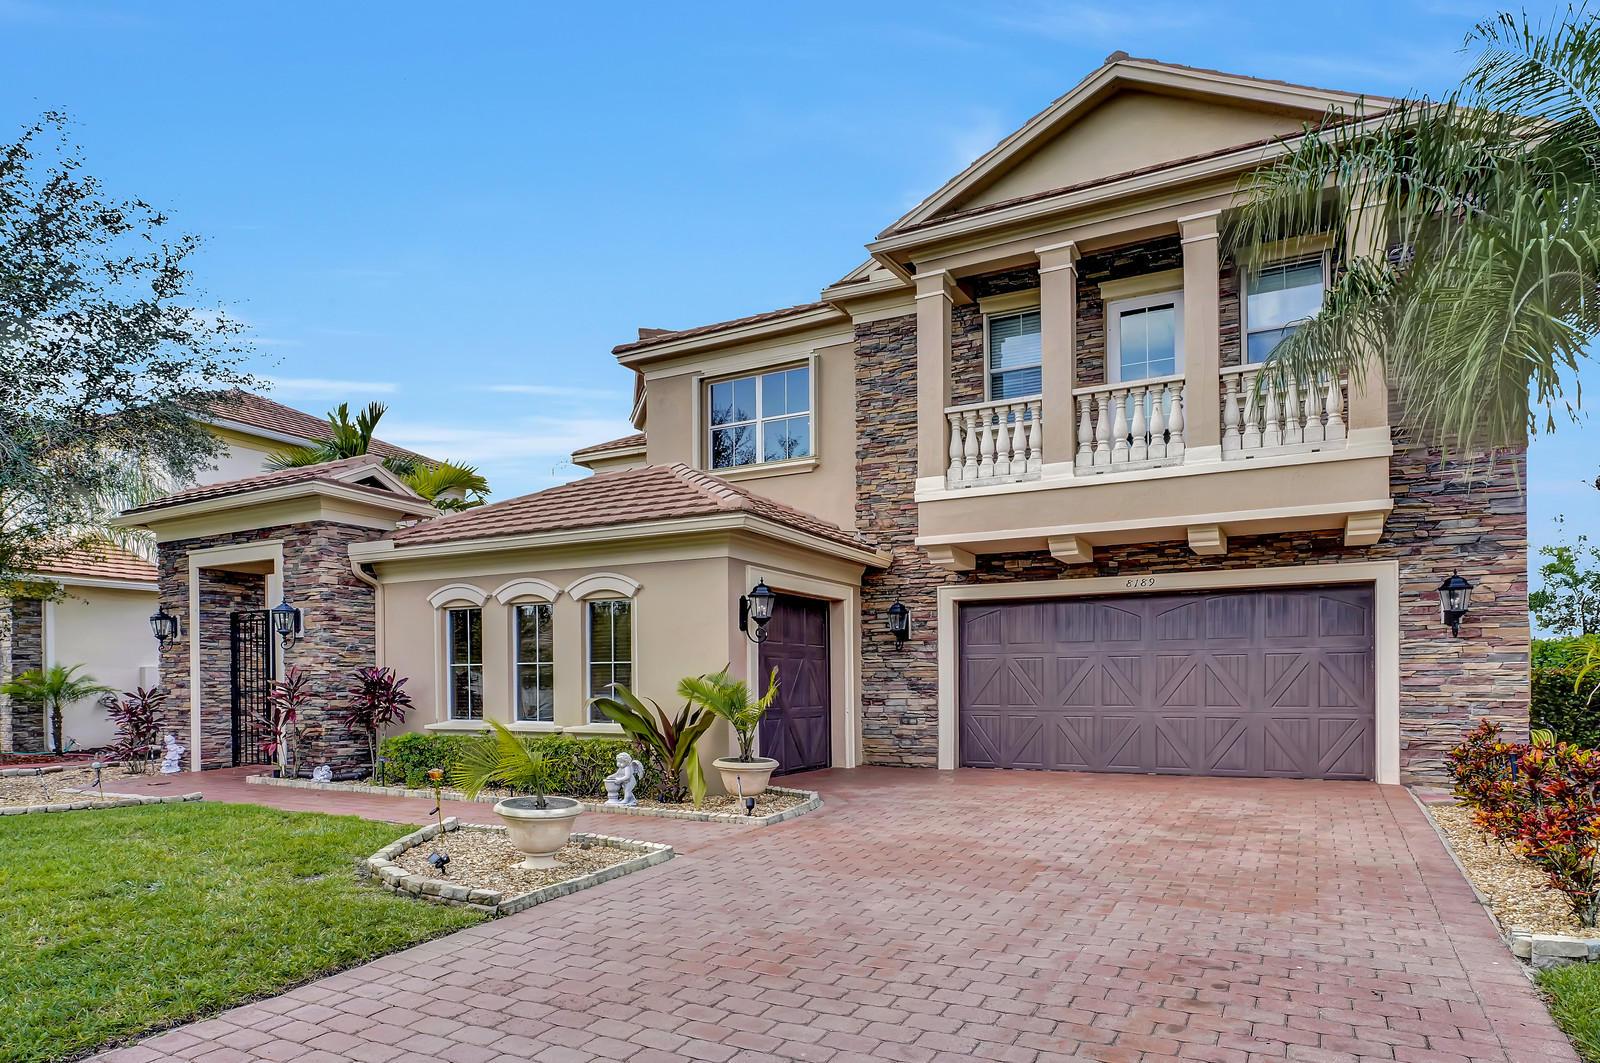 8189 Butler Greenwood Drive Royal Palm Beach, FL 33411